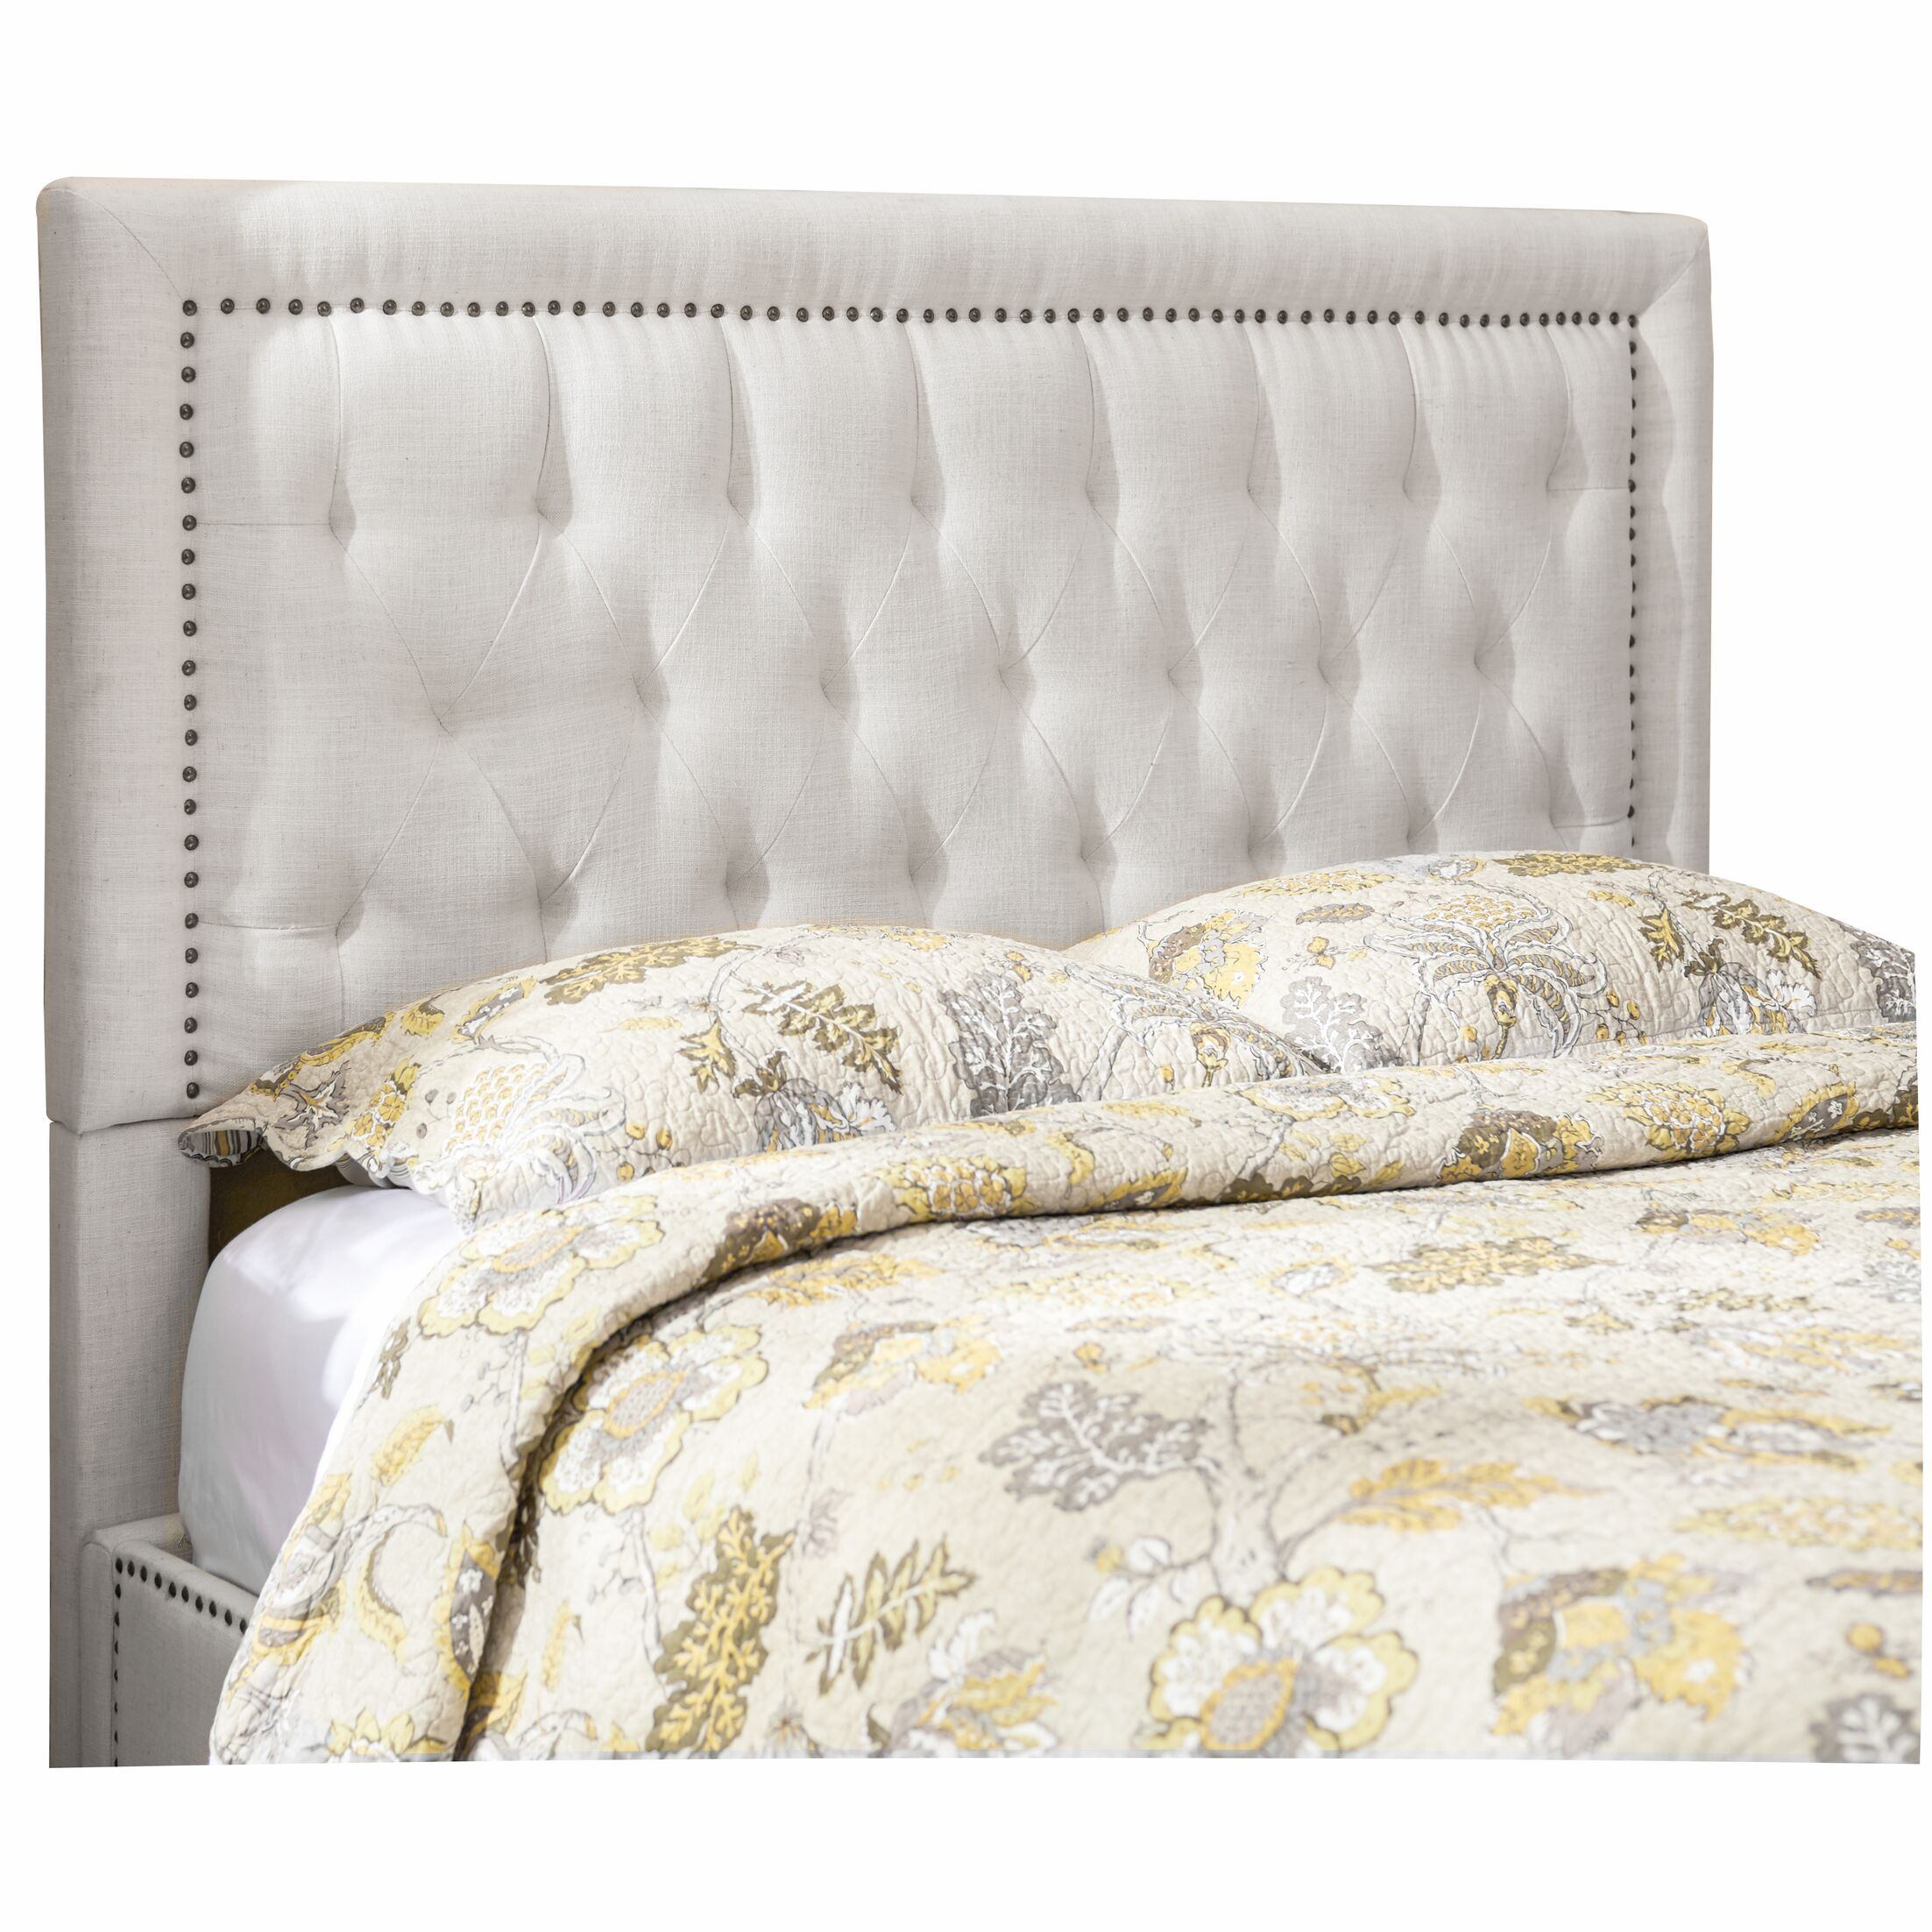 Djibril Square Upholstered Panel Headboard Upholstery: Cotton, Size: California King